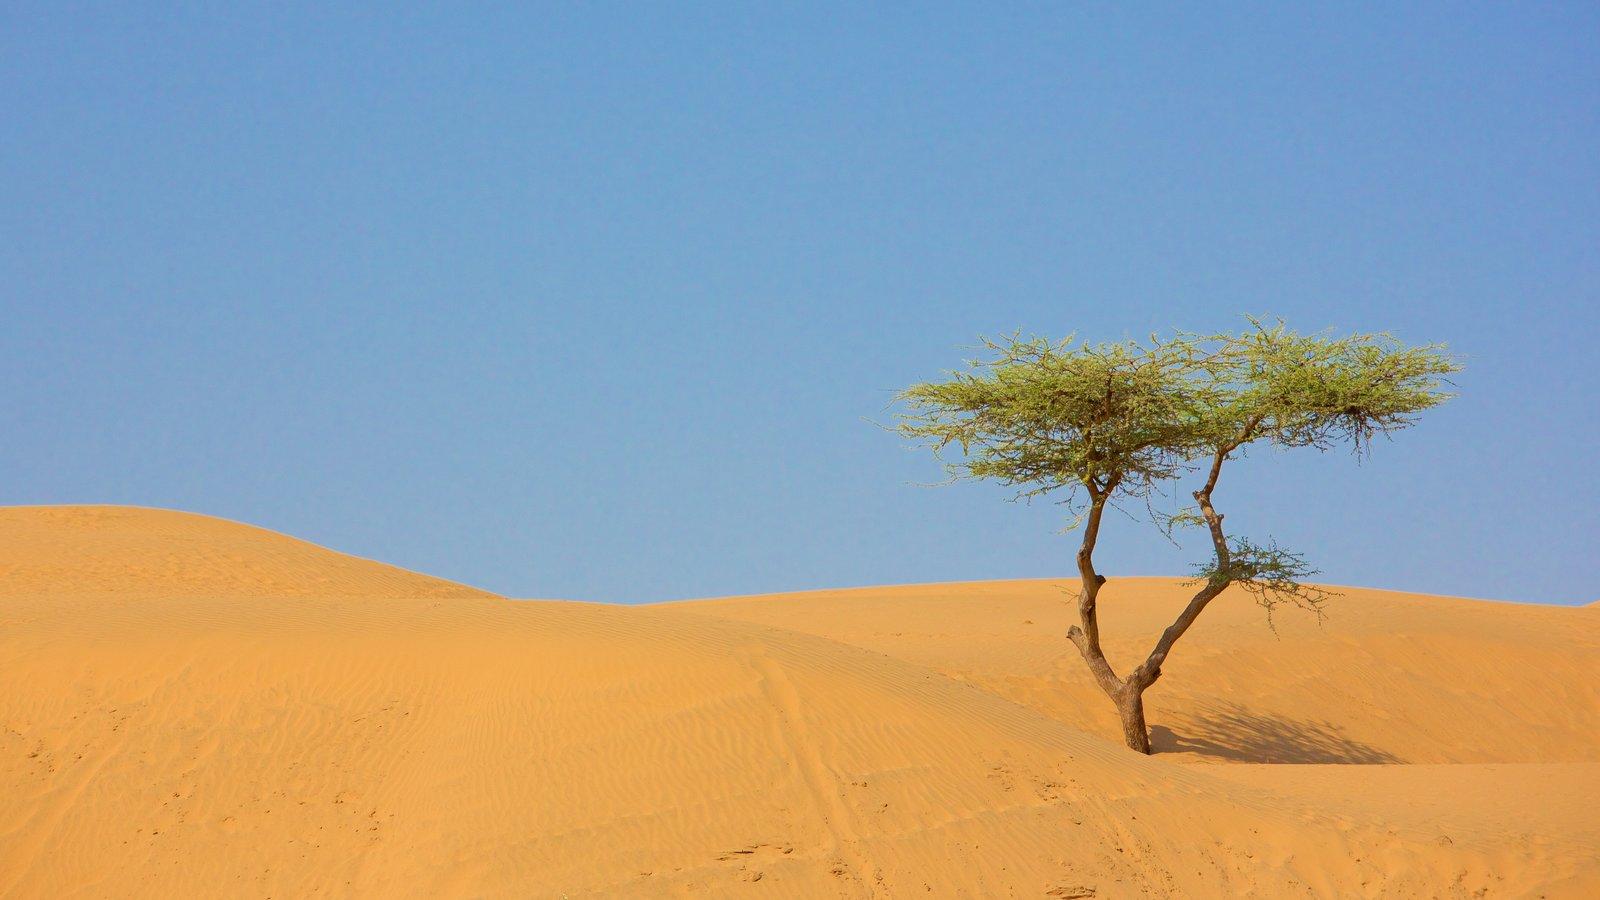 Rajasthan featuring desert views